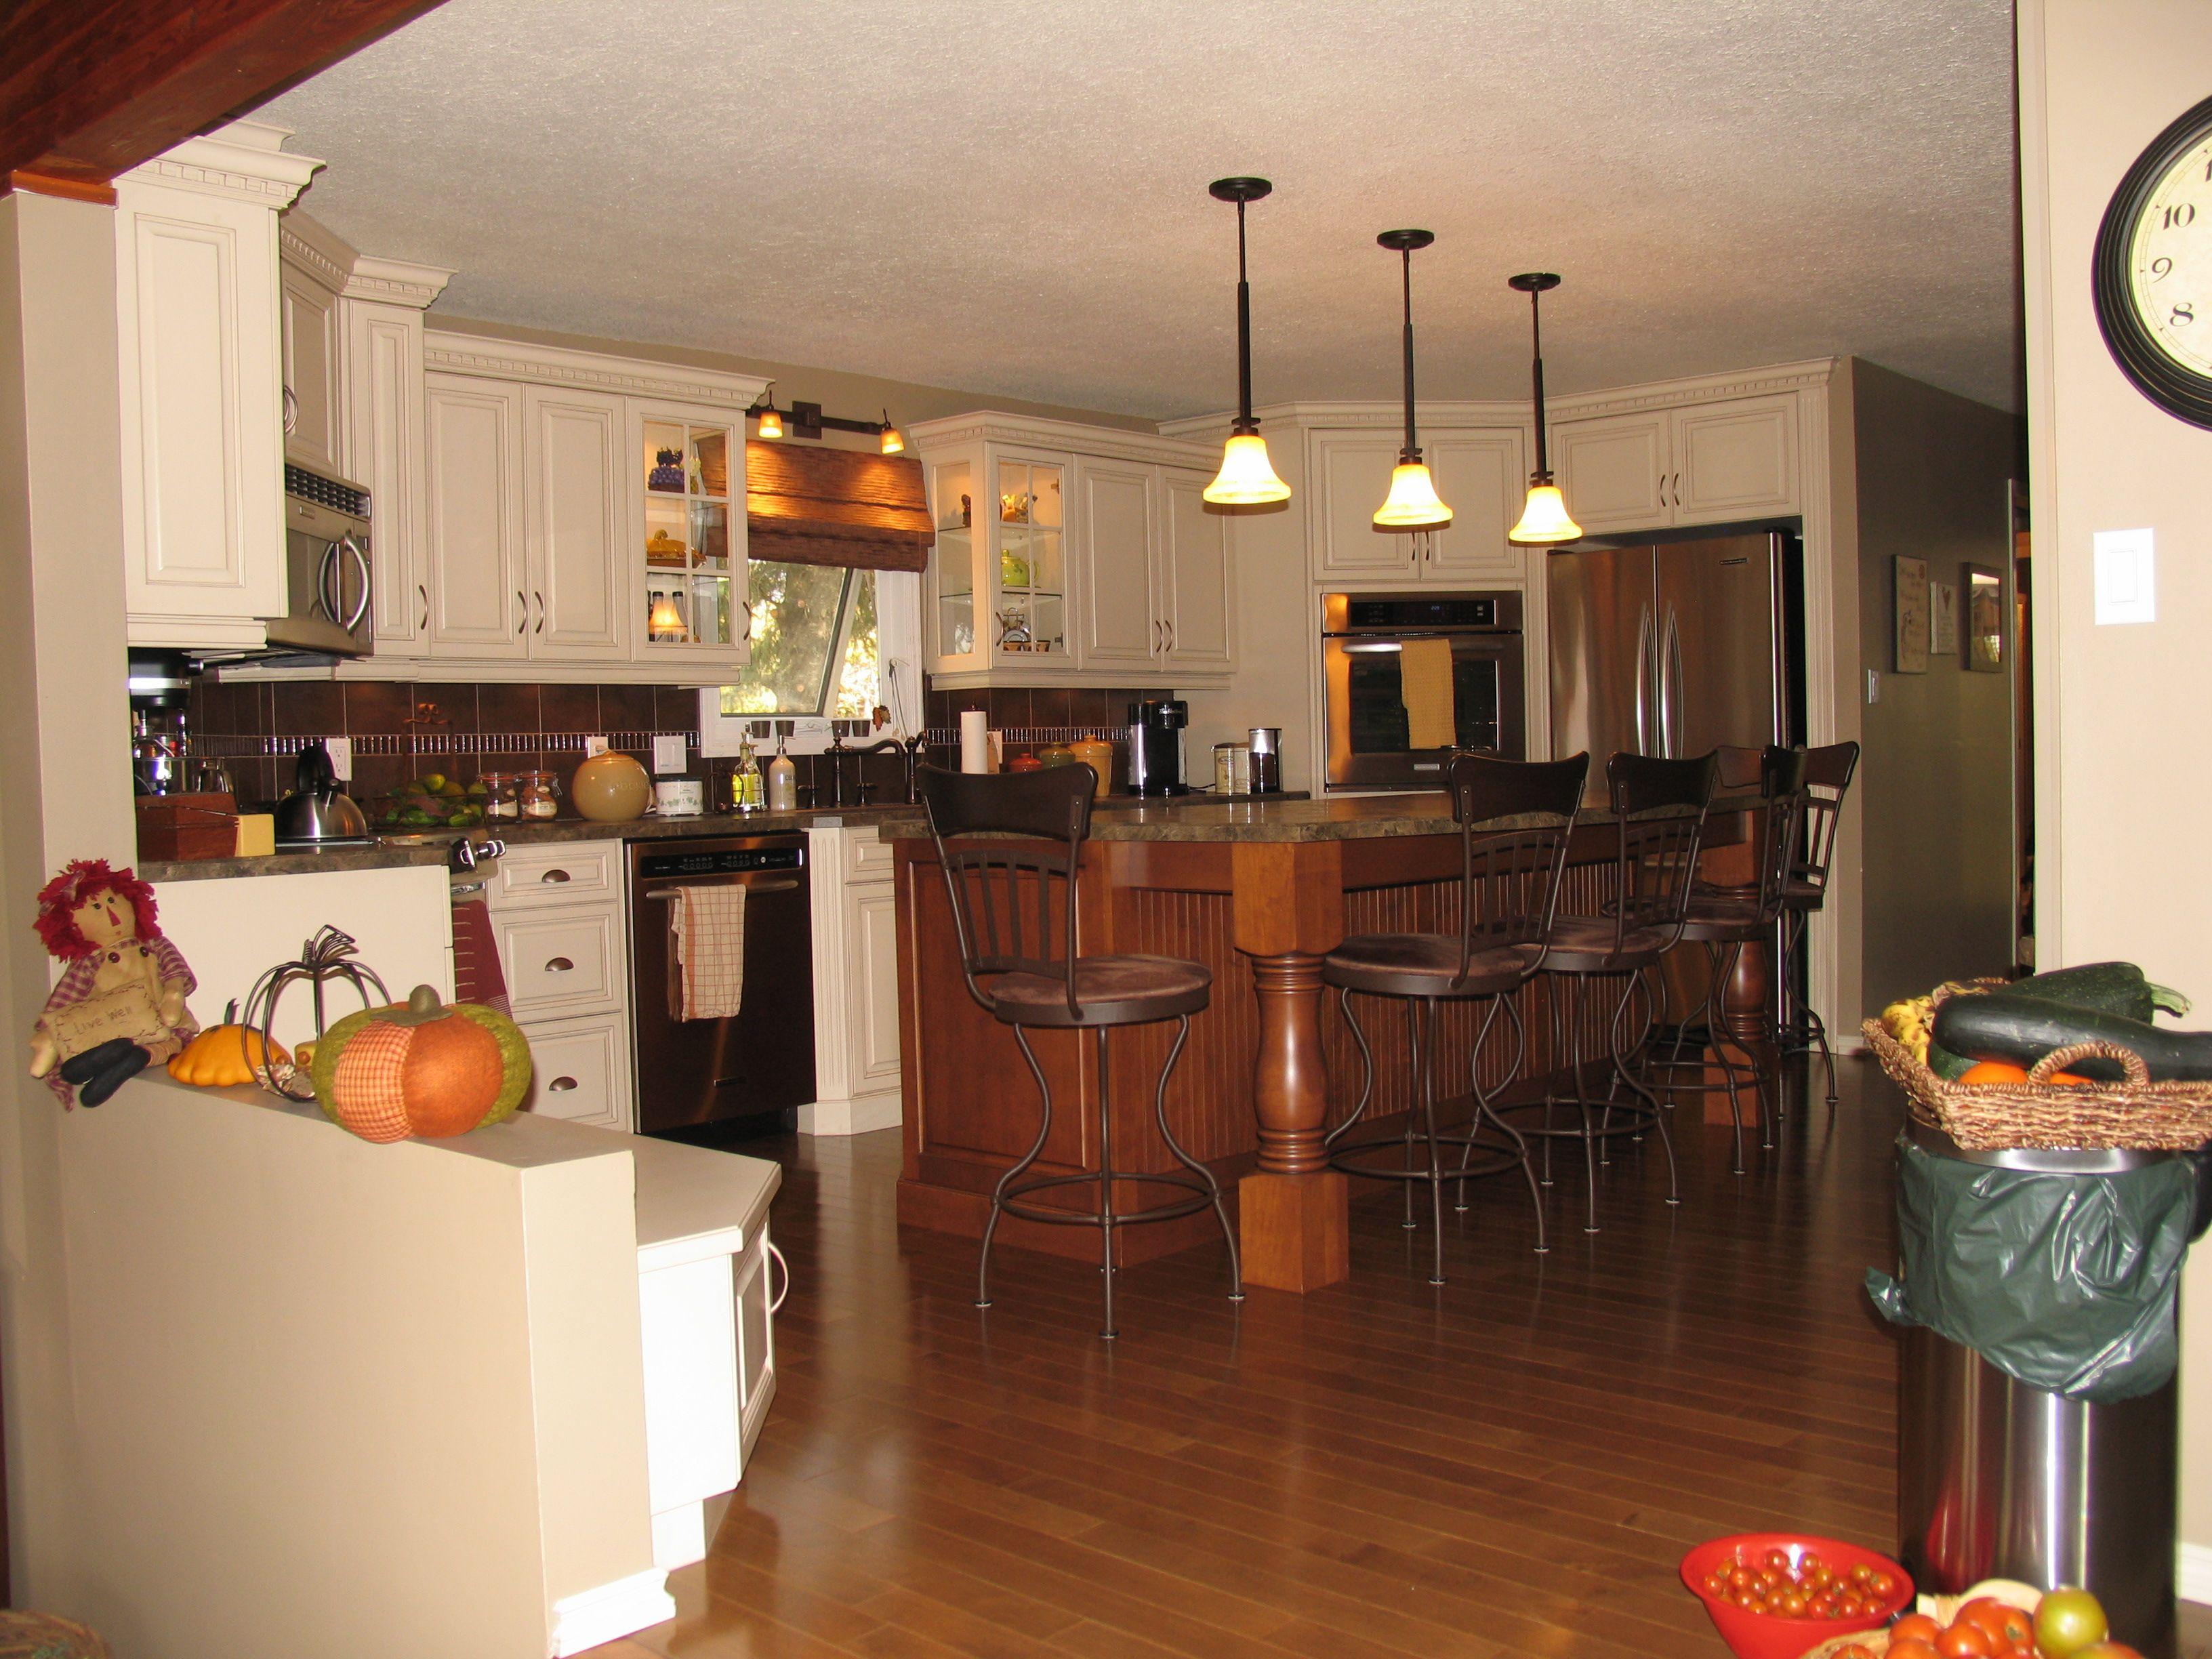 Kitchen Cabinets: Maple - Champagne, Island Cabinets ... on Maple Kitchen Cabinets With Black Countertops  id=28562